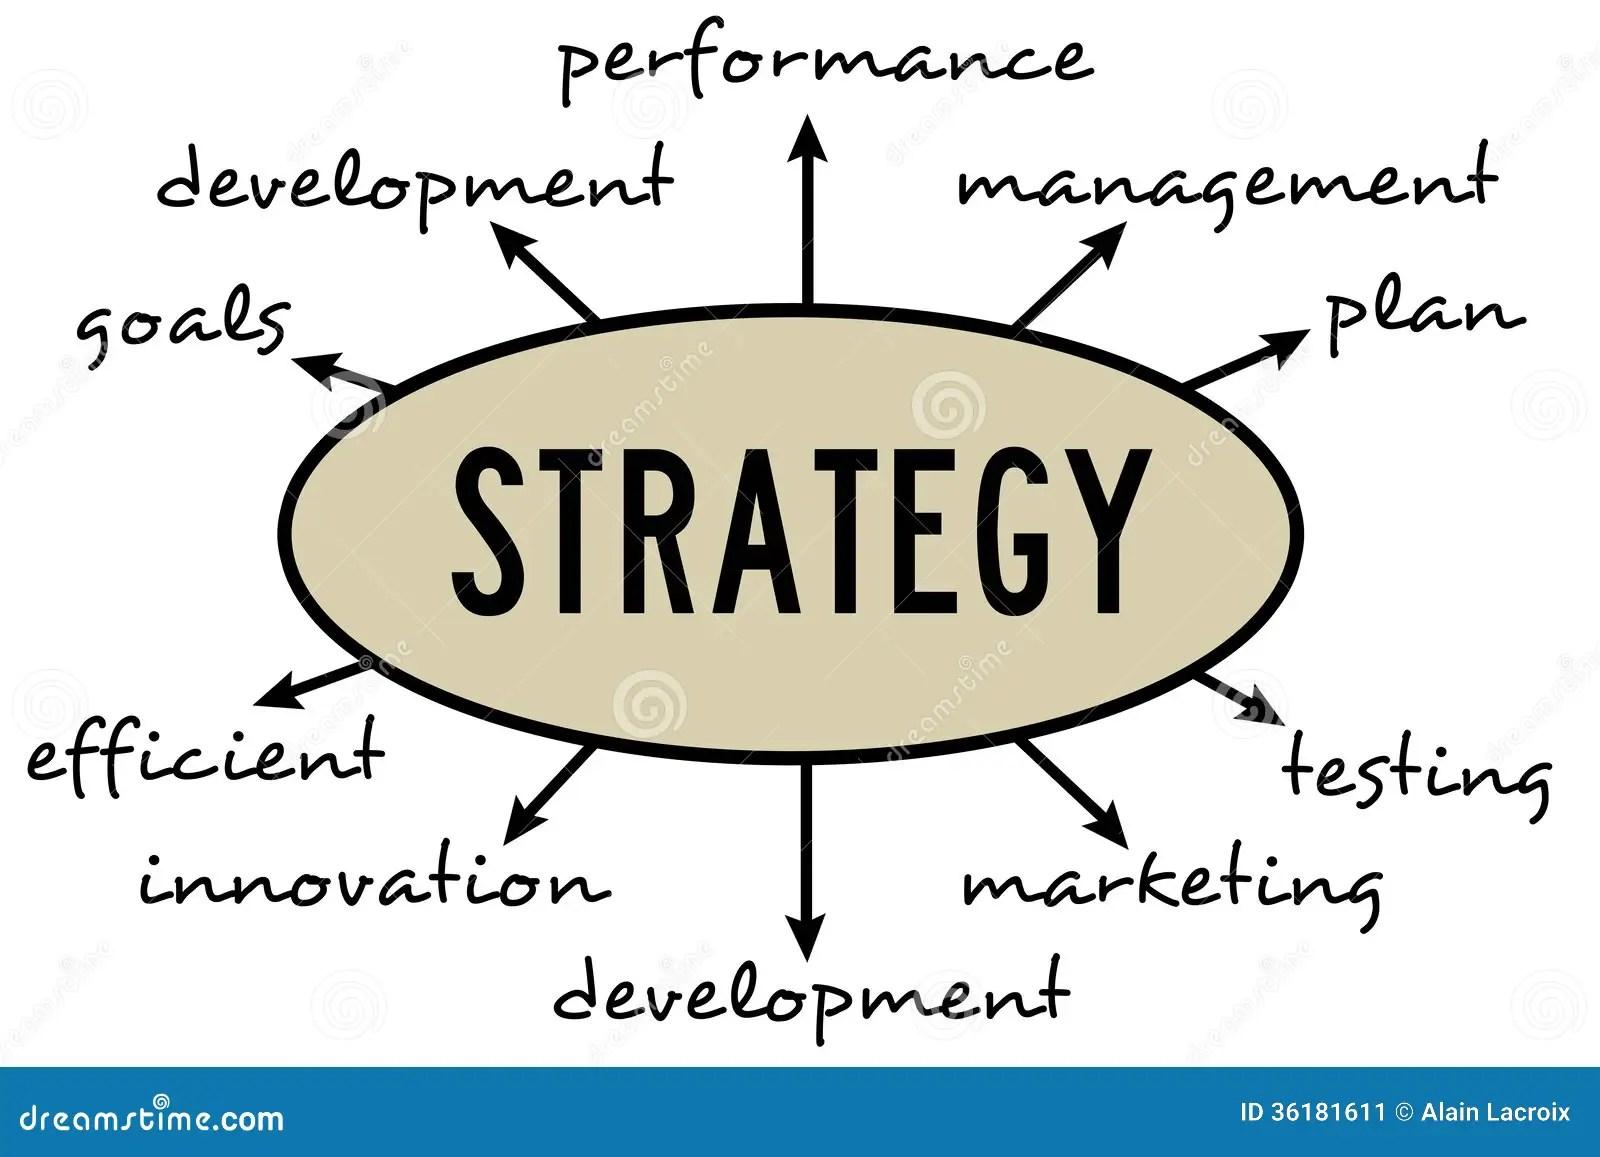 strategic planning framework diagram solar panel wiring schematic implementation business royalty free